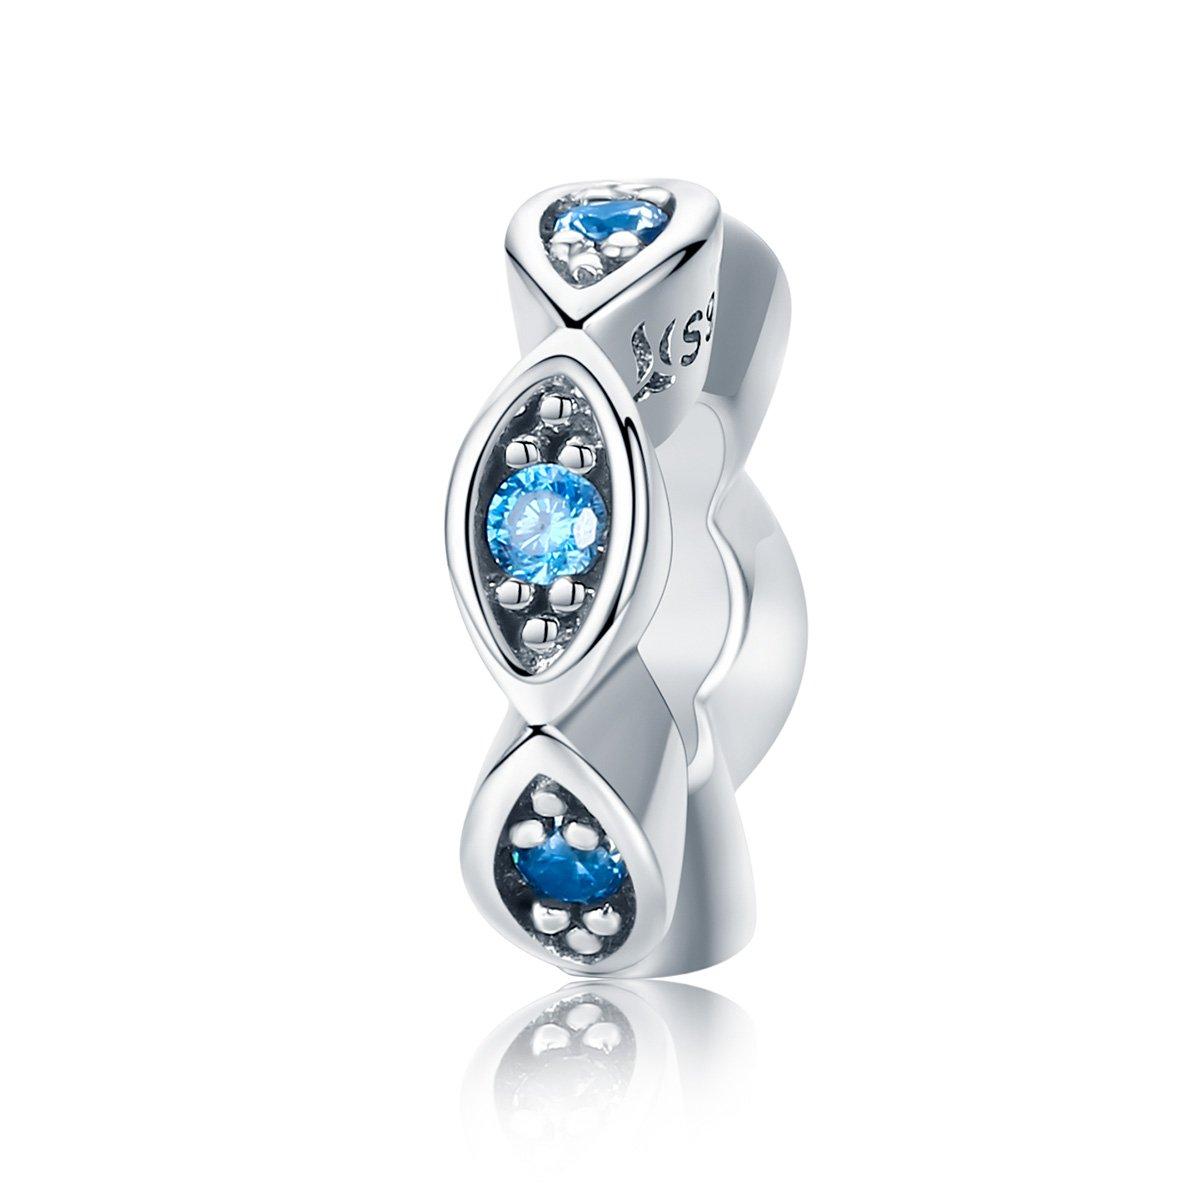 Everbling Fancy CZ Spacer Evil Eye Flower Daisies Star Galaxy 925 Sterling Silver Bead For European Charm Bracelet (Blue Evil Eyes)